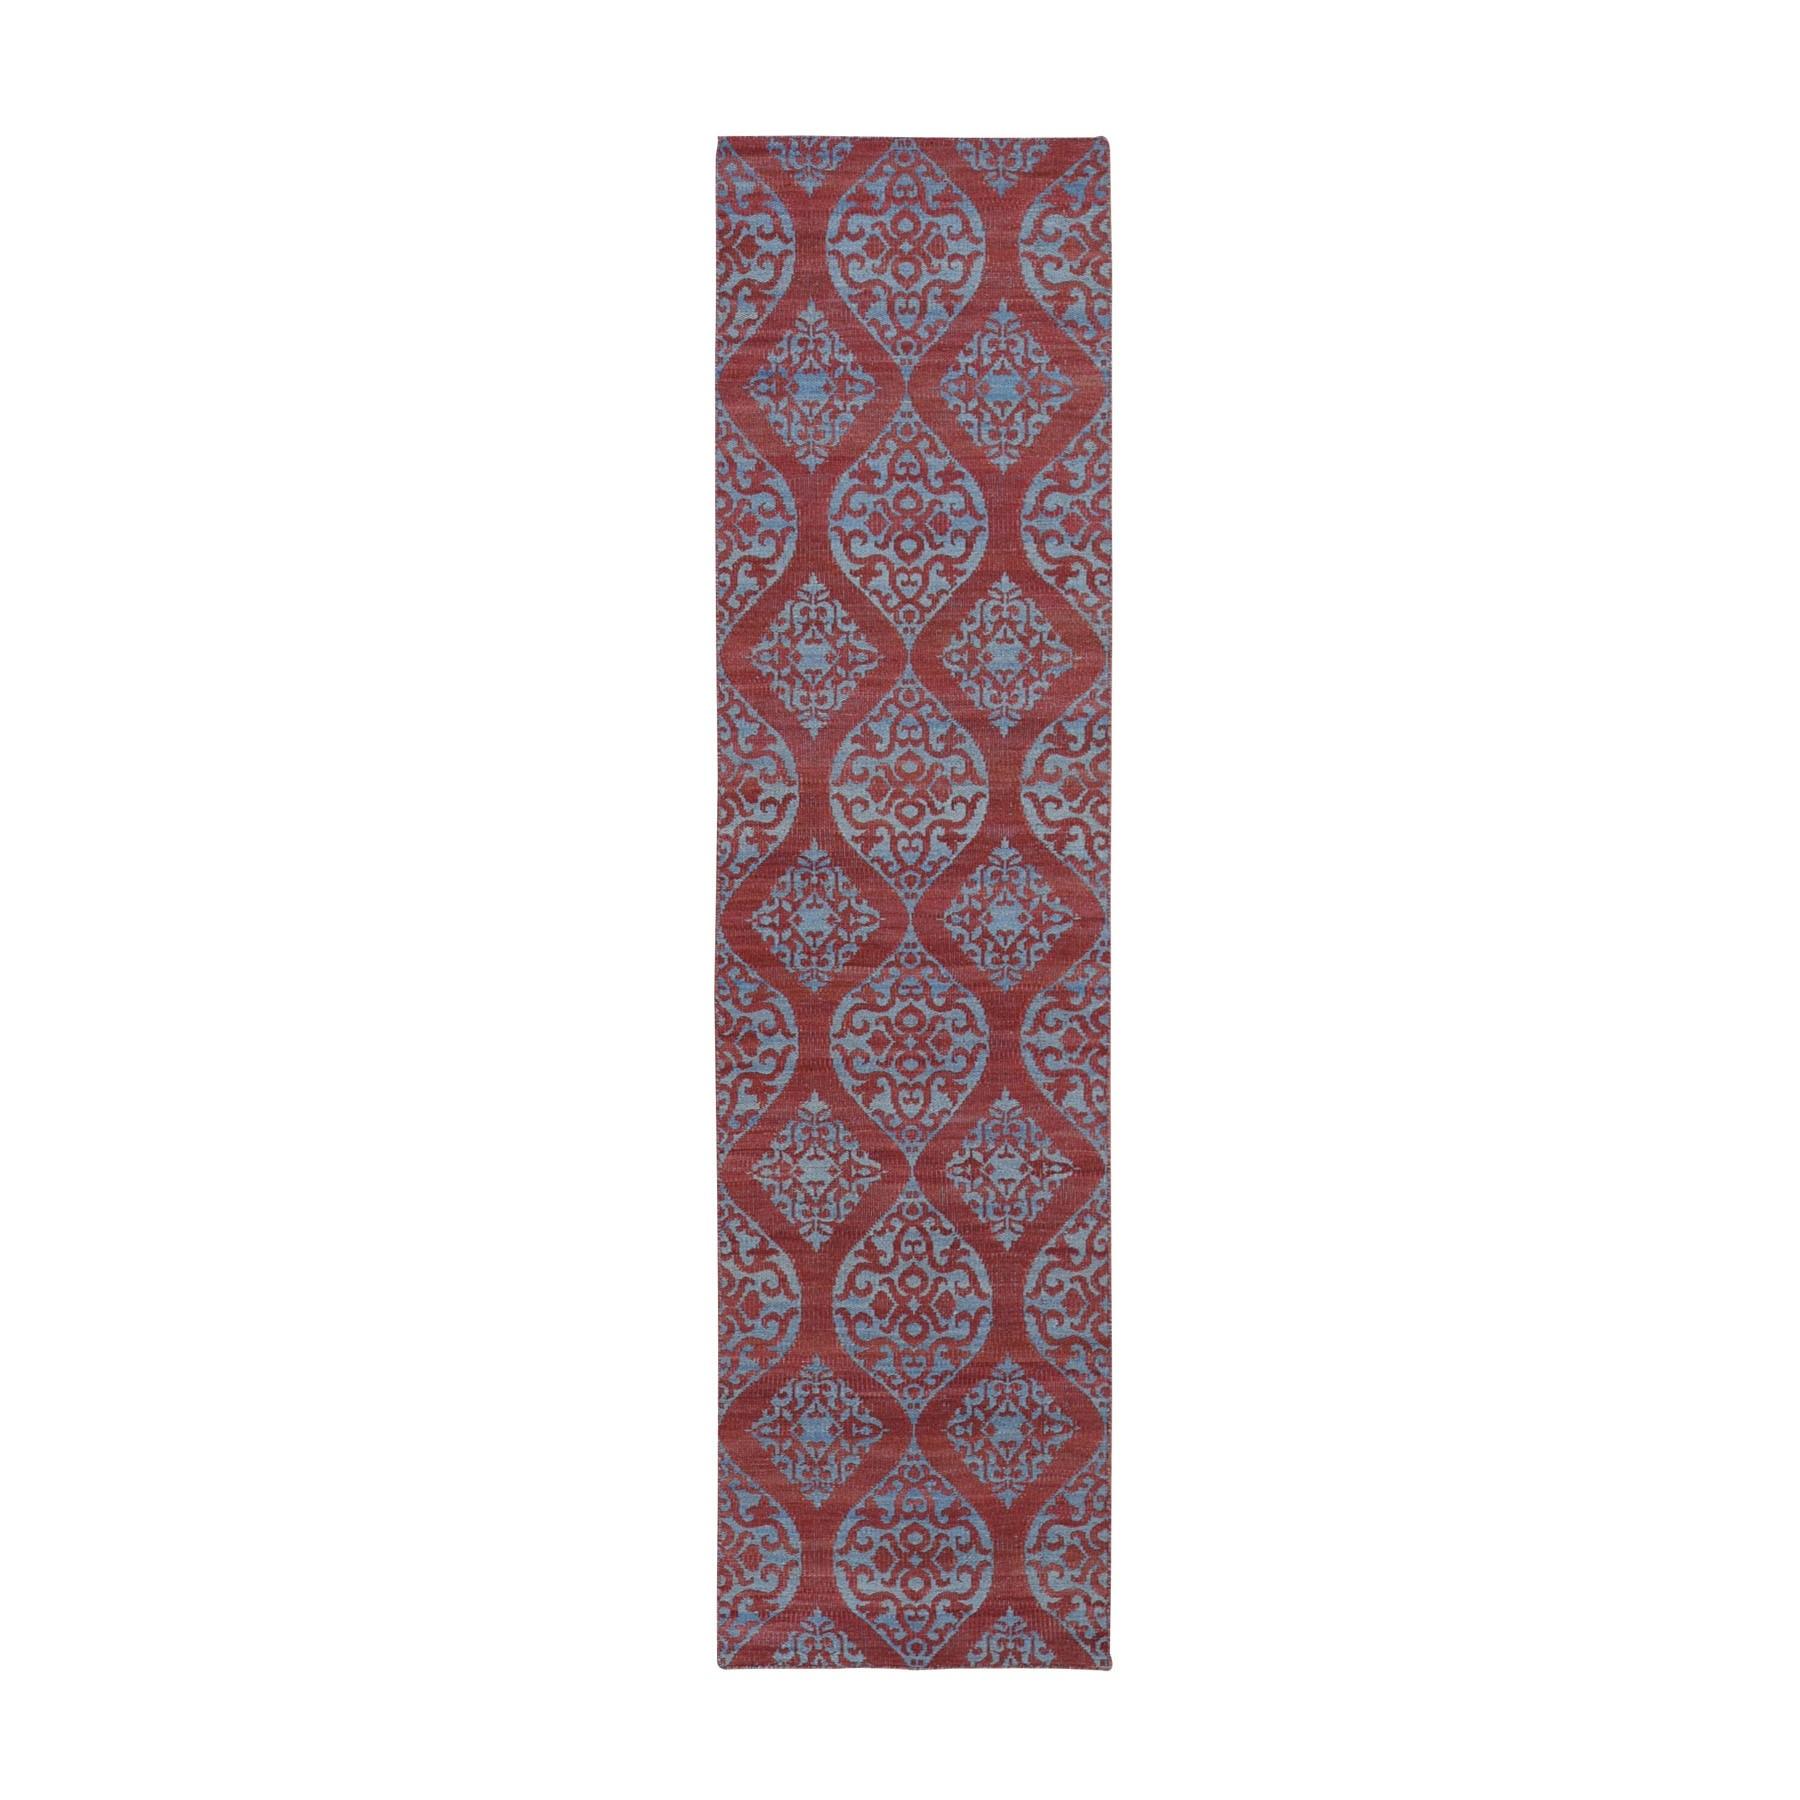 "2'6""x9'1"" Hand Woven Flat Weave Pure Wool Reversible Kilim Runner Oriental Rug"